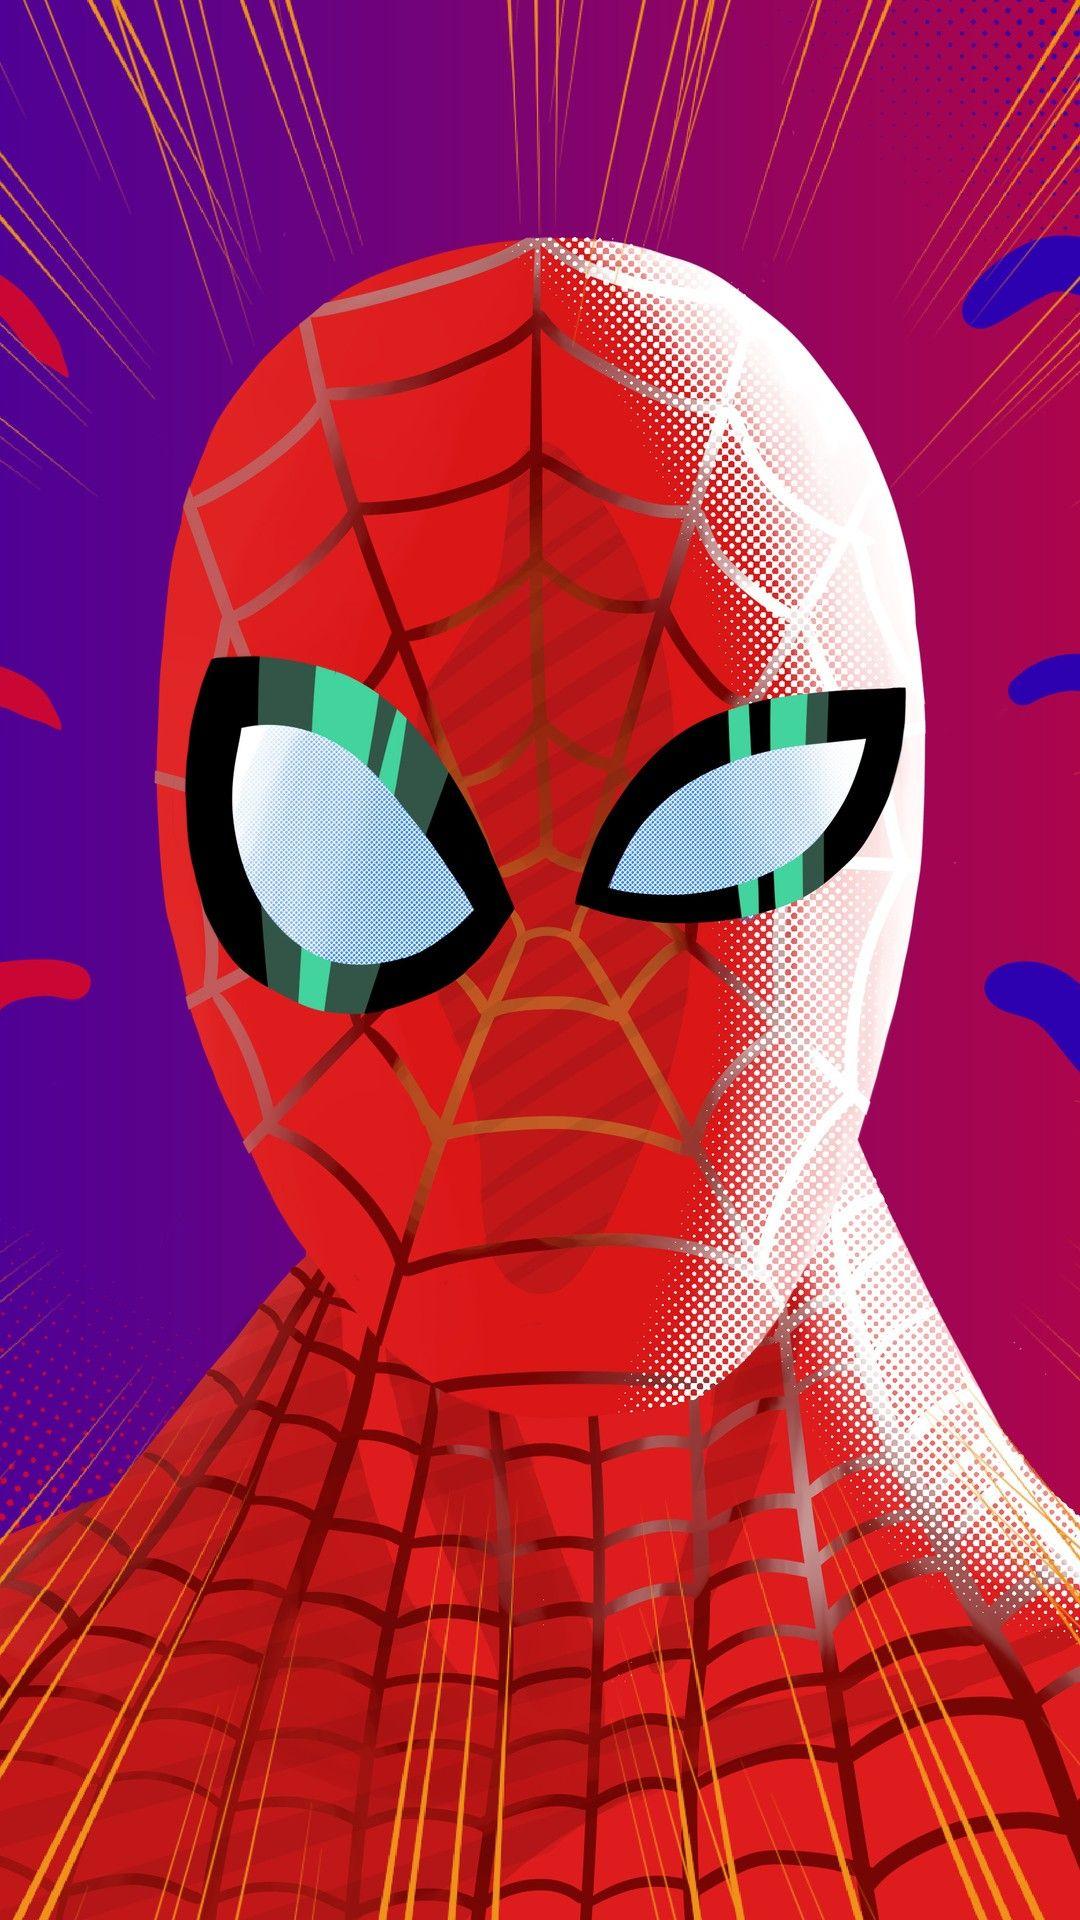 Pin by Somon on Spiderman Man wallpaper, Spiderman